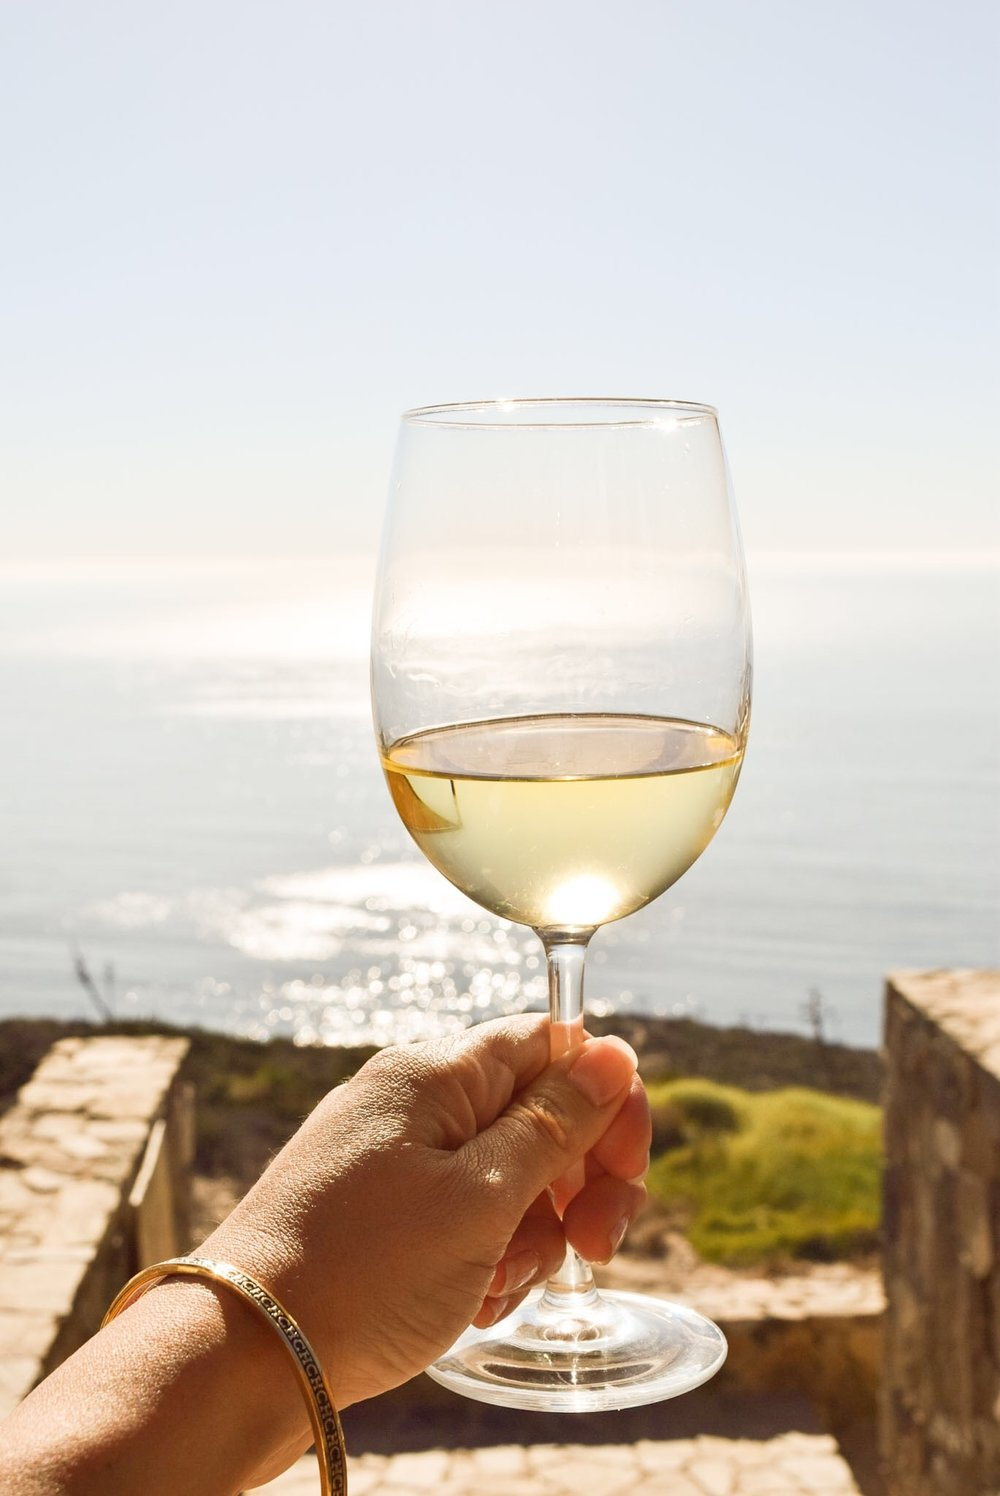 Sauvignon Blanc and Chardonnay Blend, Cuatro Cuatros